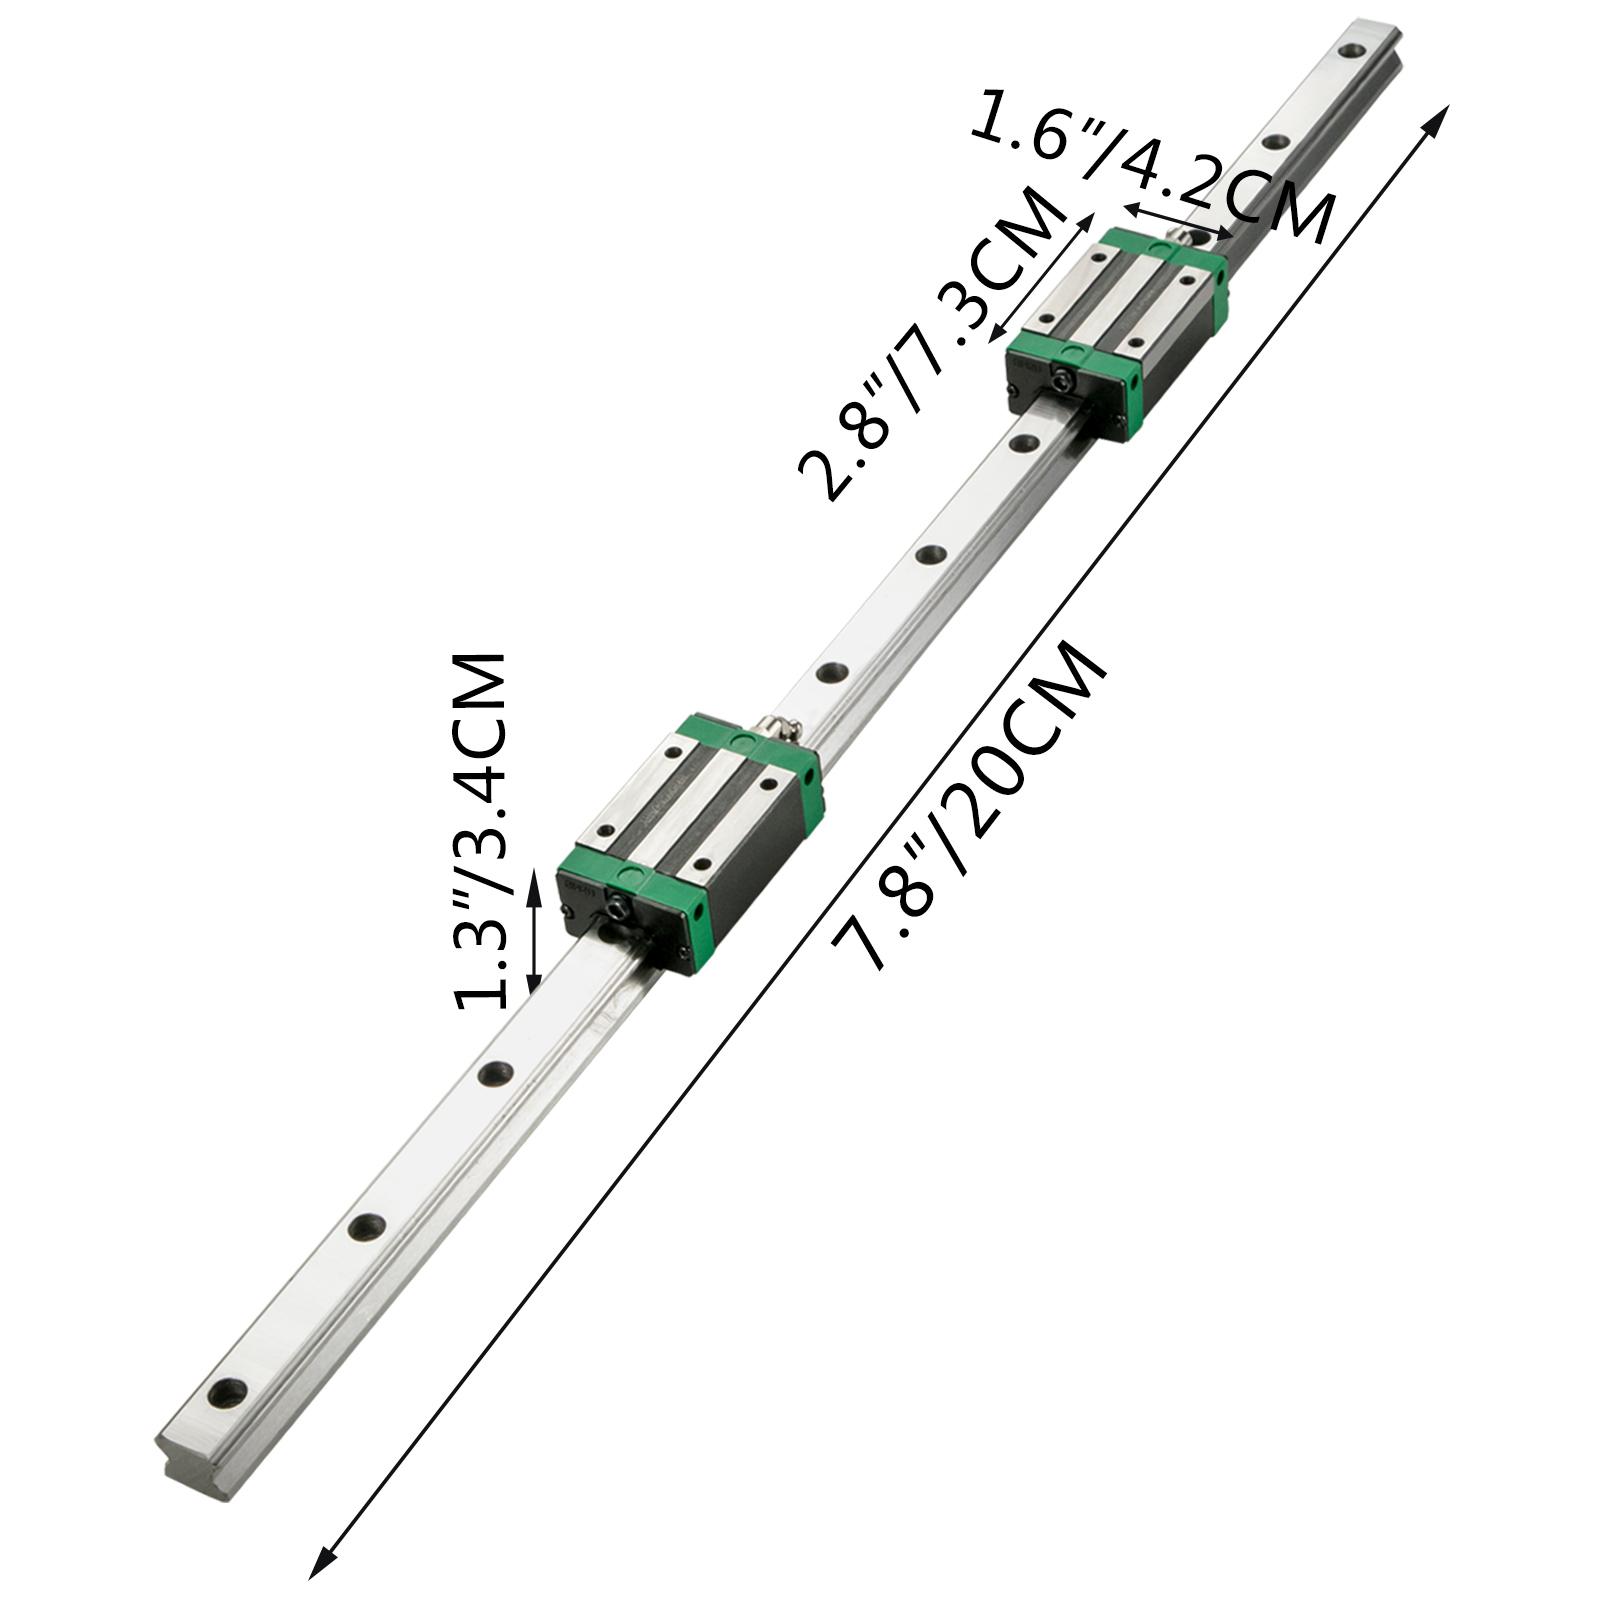 Guida-Lineare-CNC-HGR20-200mm-2-Pezzi-Blocco-di-Cuscinetti-4-Pezzi miniatura 8